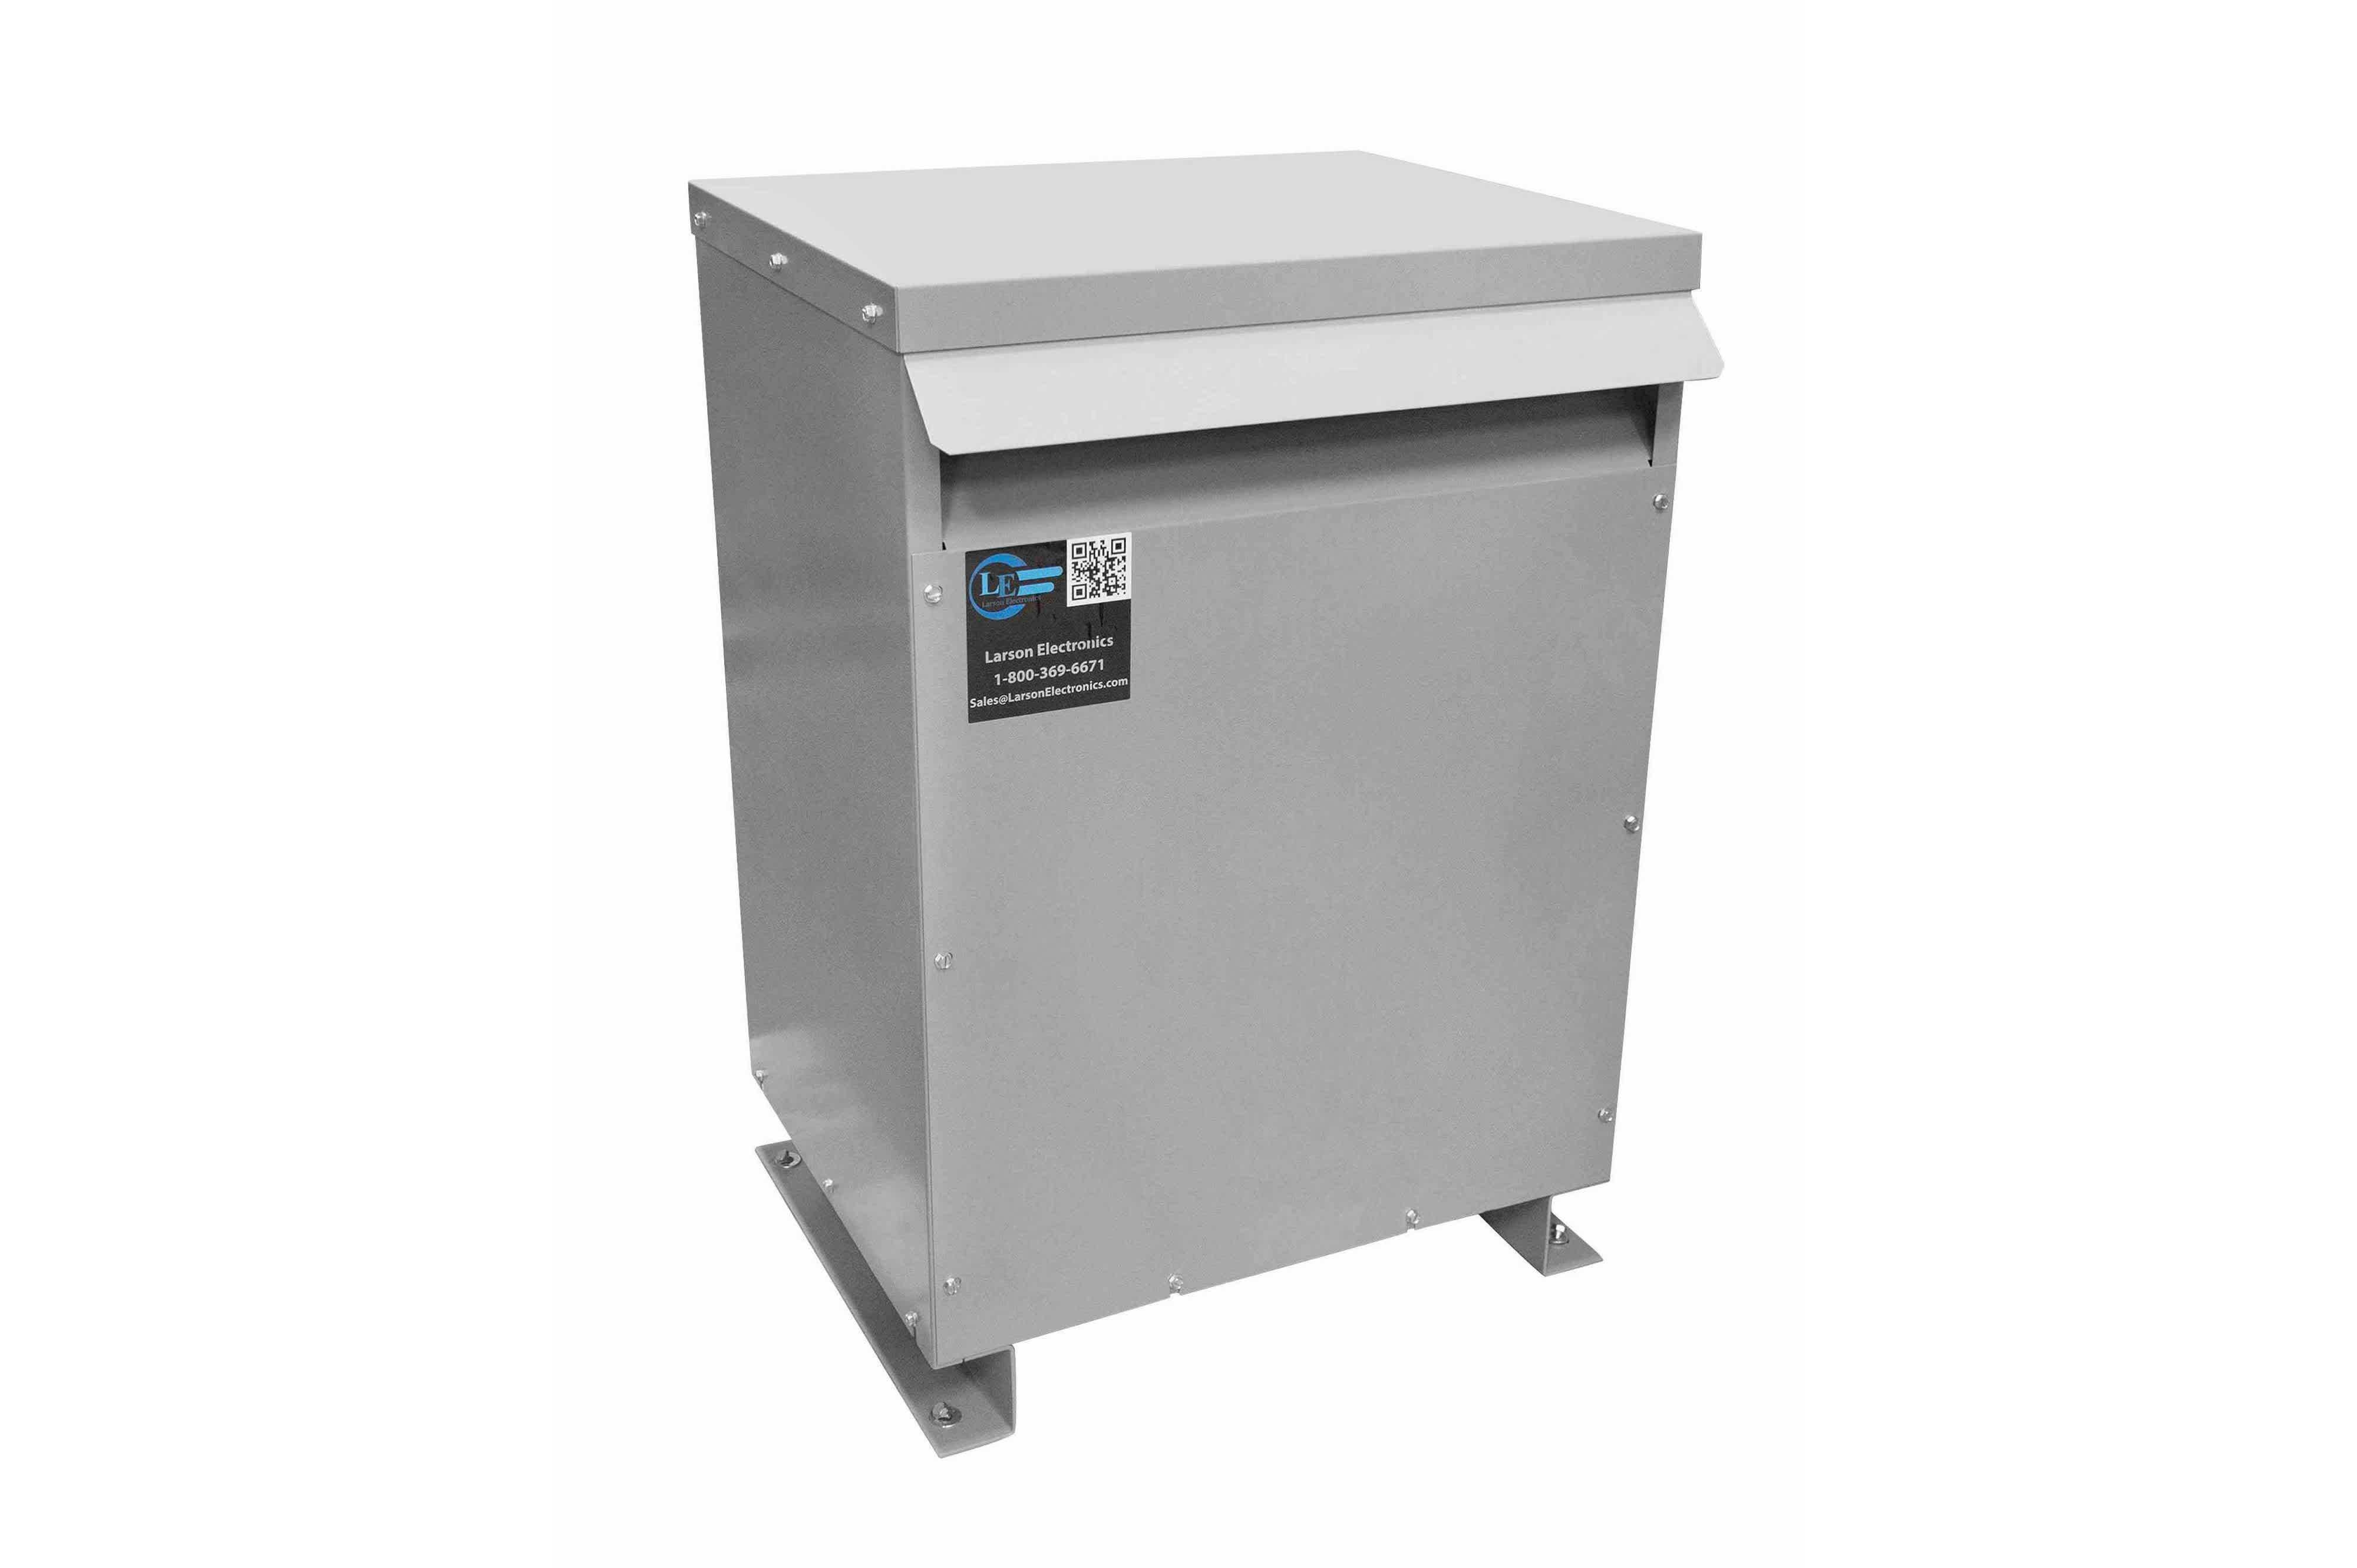 200 kVA 3PH Isolation Transformer, 230V Wye Primary, 480Y/277 Wye-N Secondary, N3R, Ventilated, 60 Hz